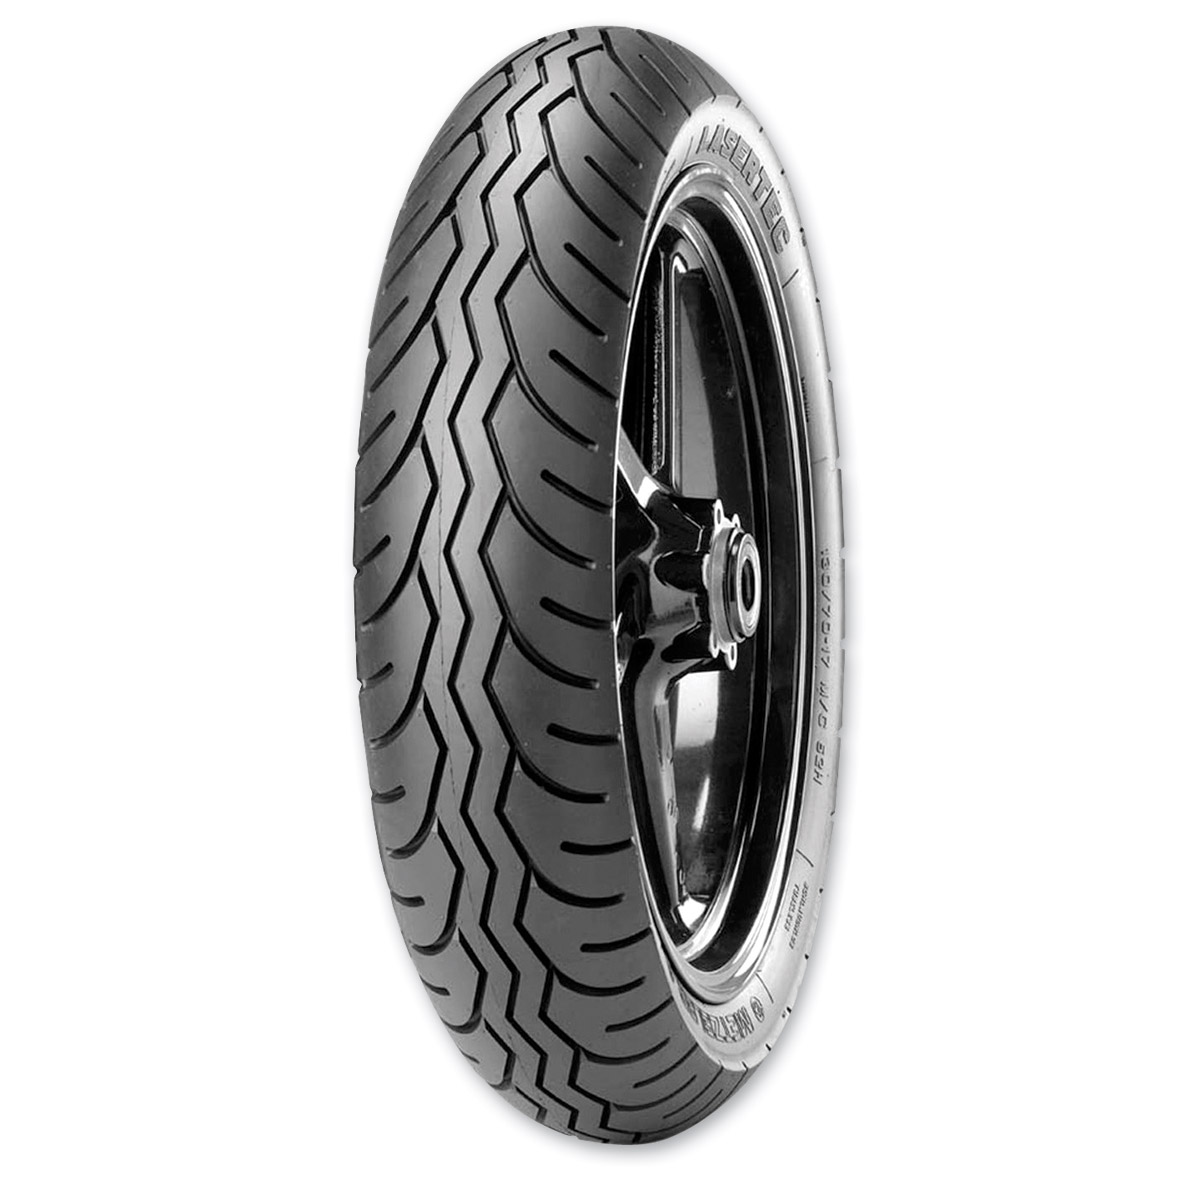 Metzeler Lasertec 150/80B16 Rear Tire